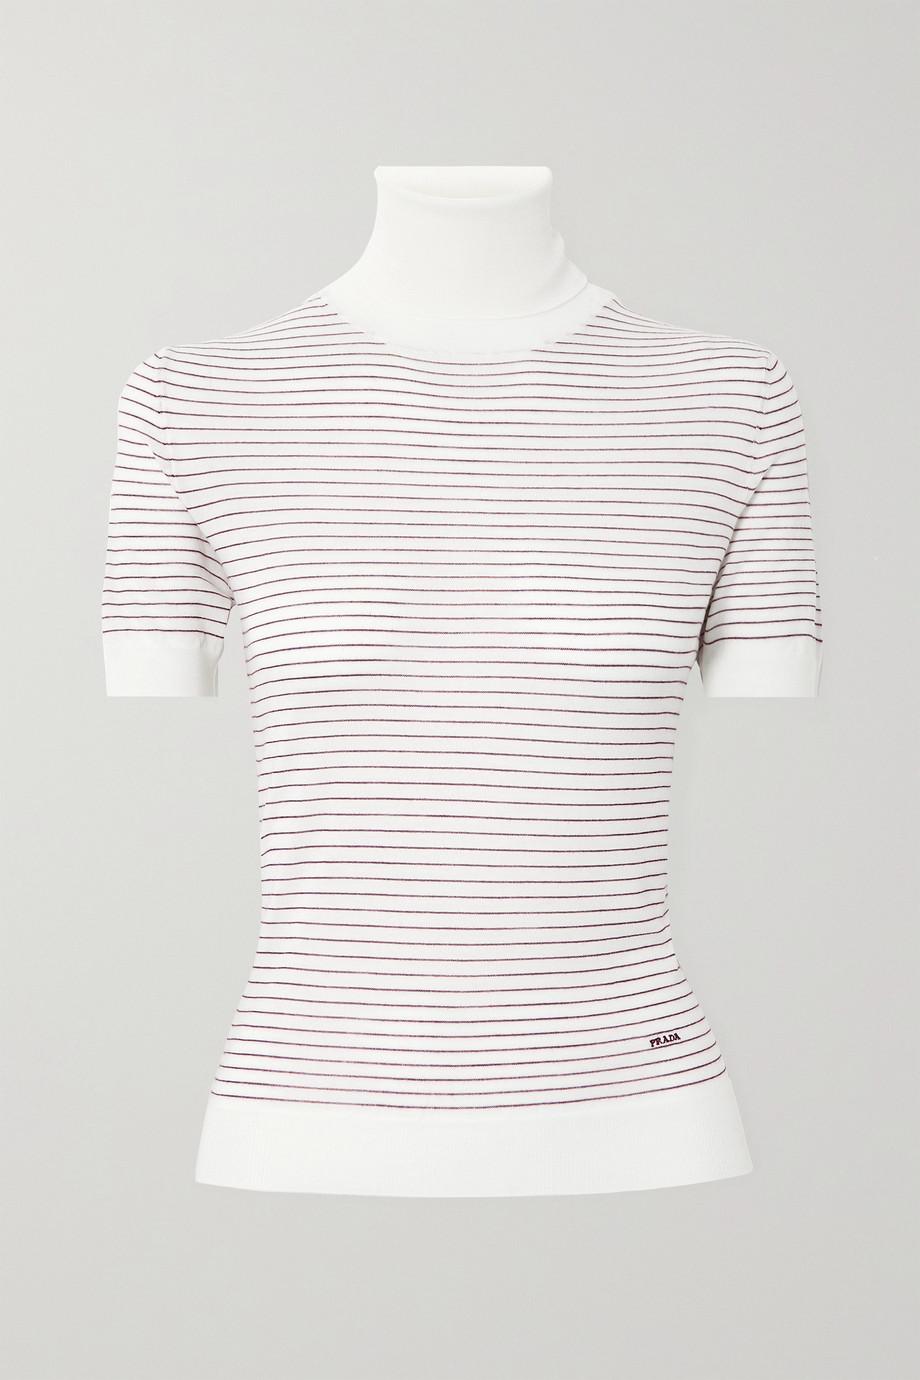 Prada Embroidered striped wool turtleneck top